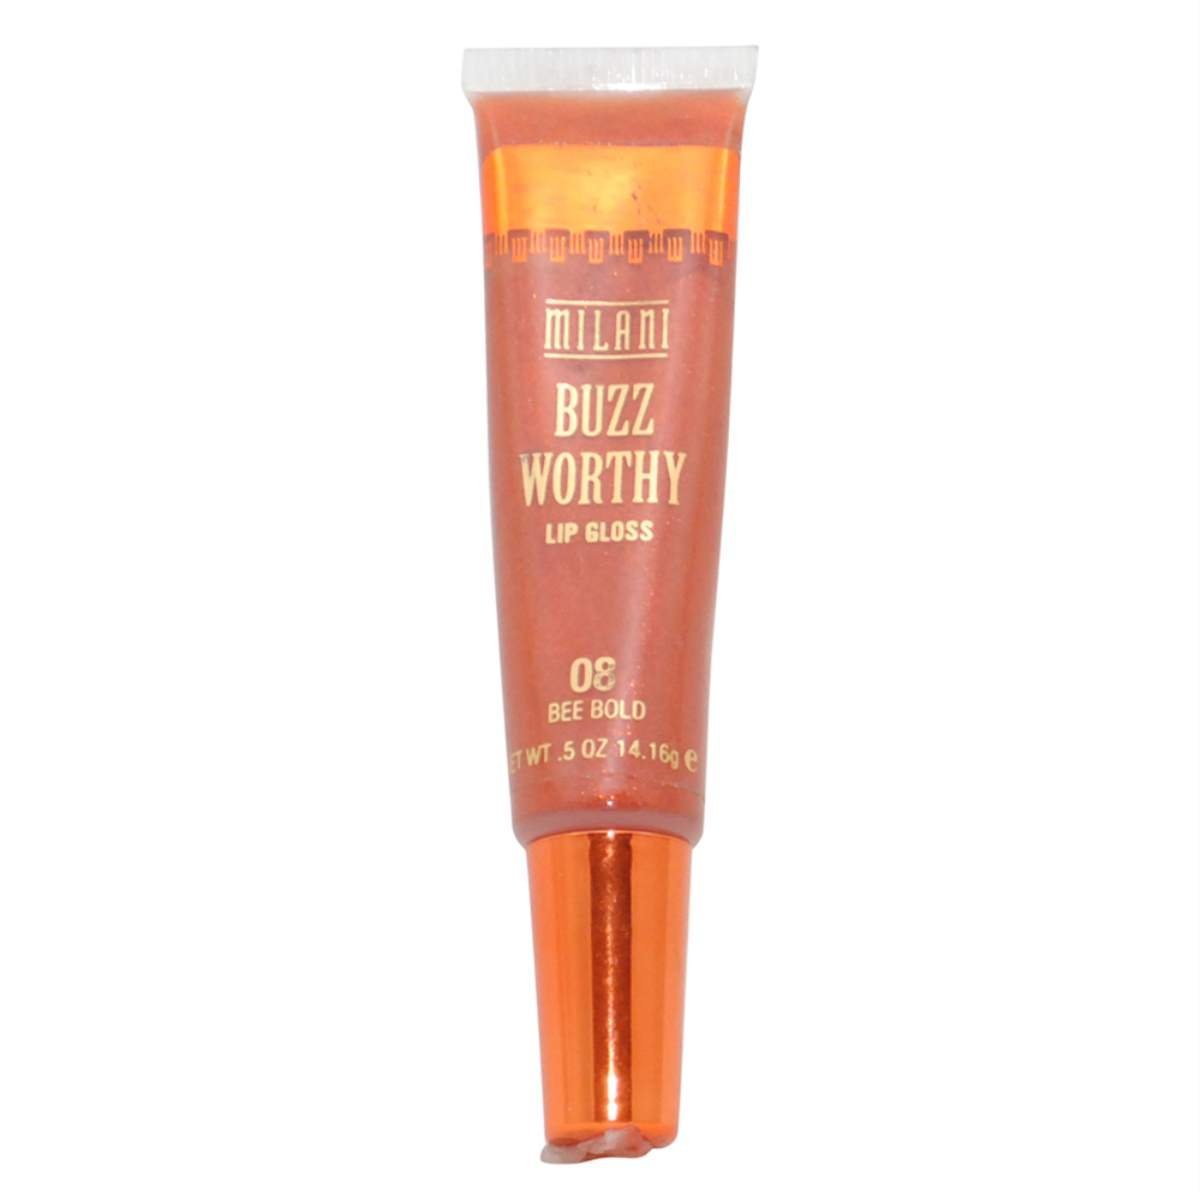 Milani Buzz Worthy BEE Bold 08 Lip Gloss